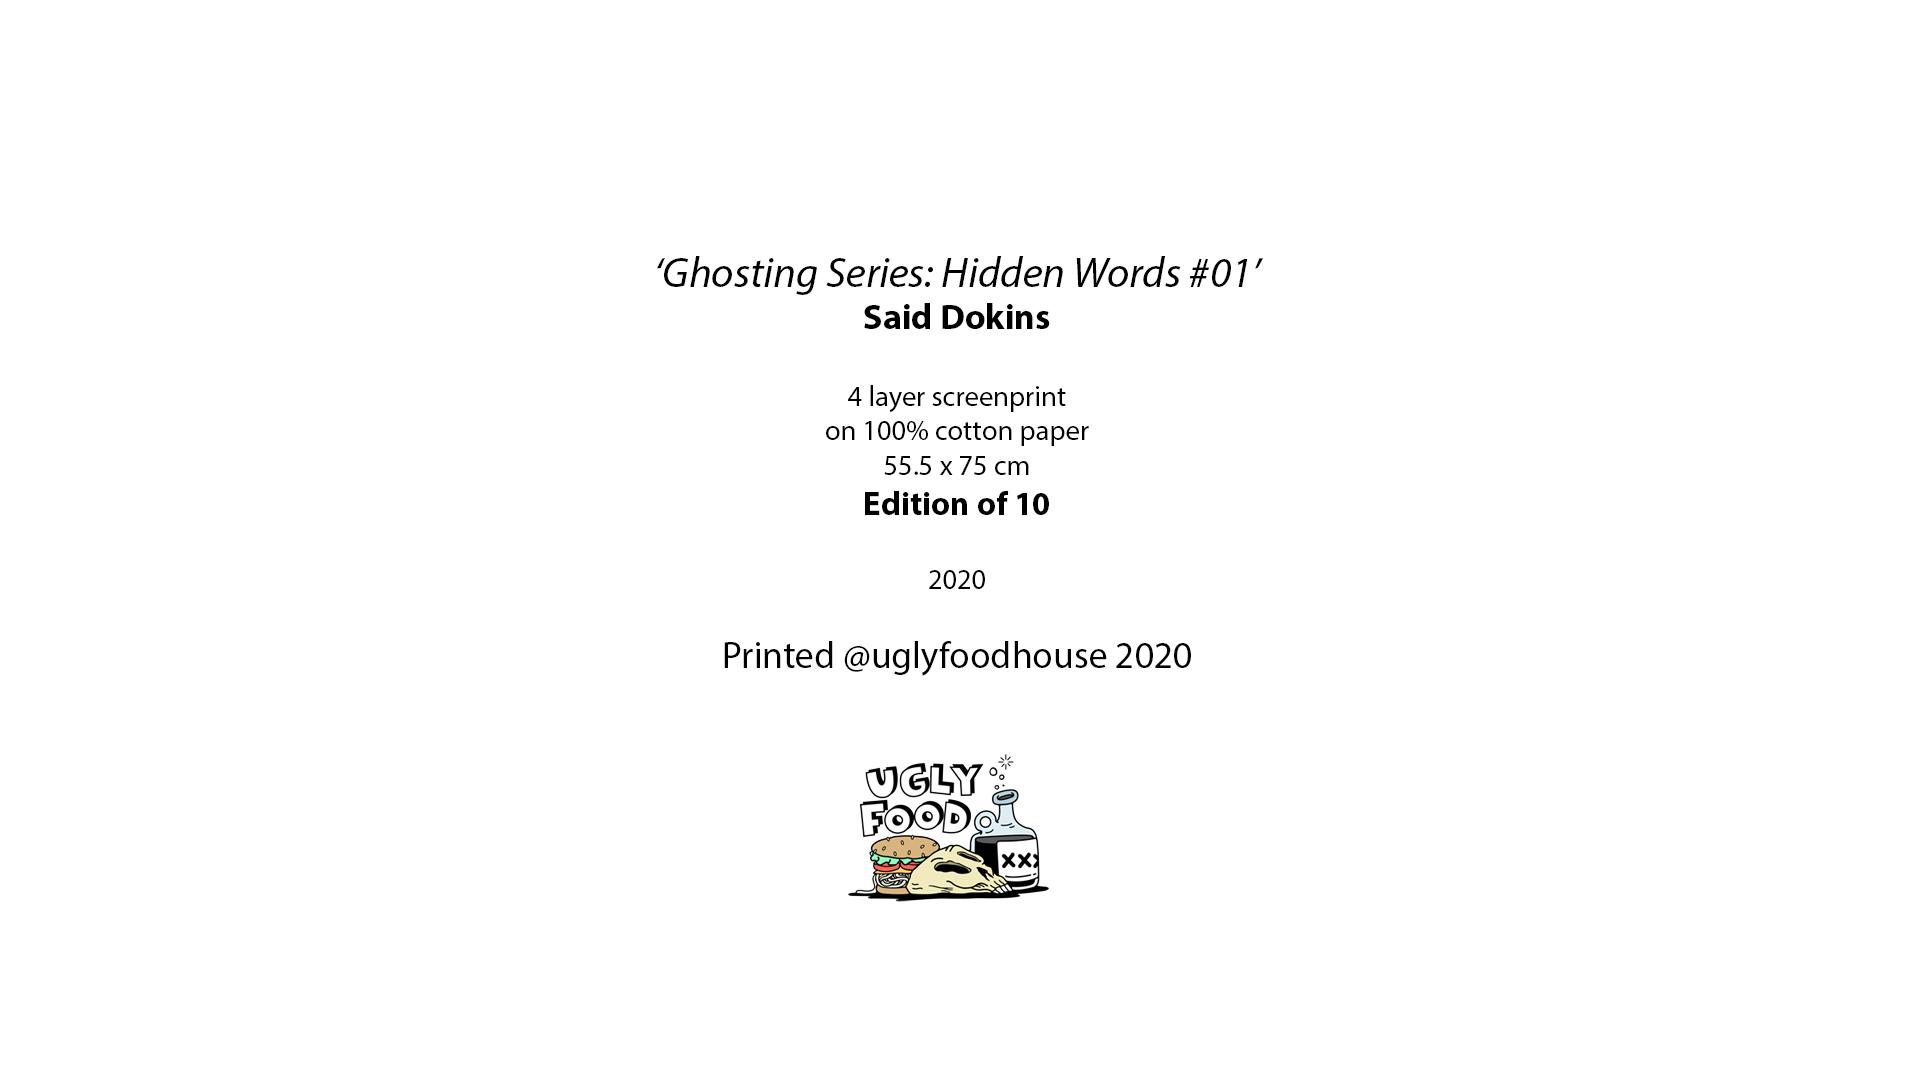 SAID  ghosting series 1 text vid